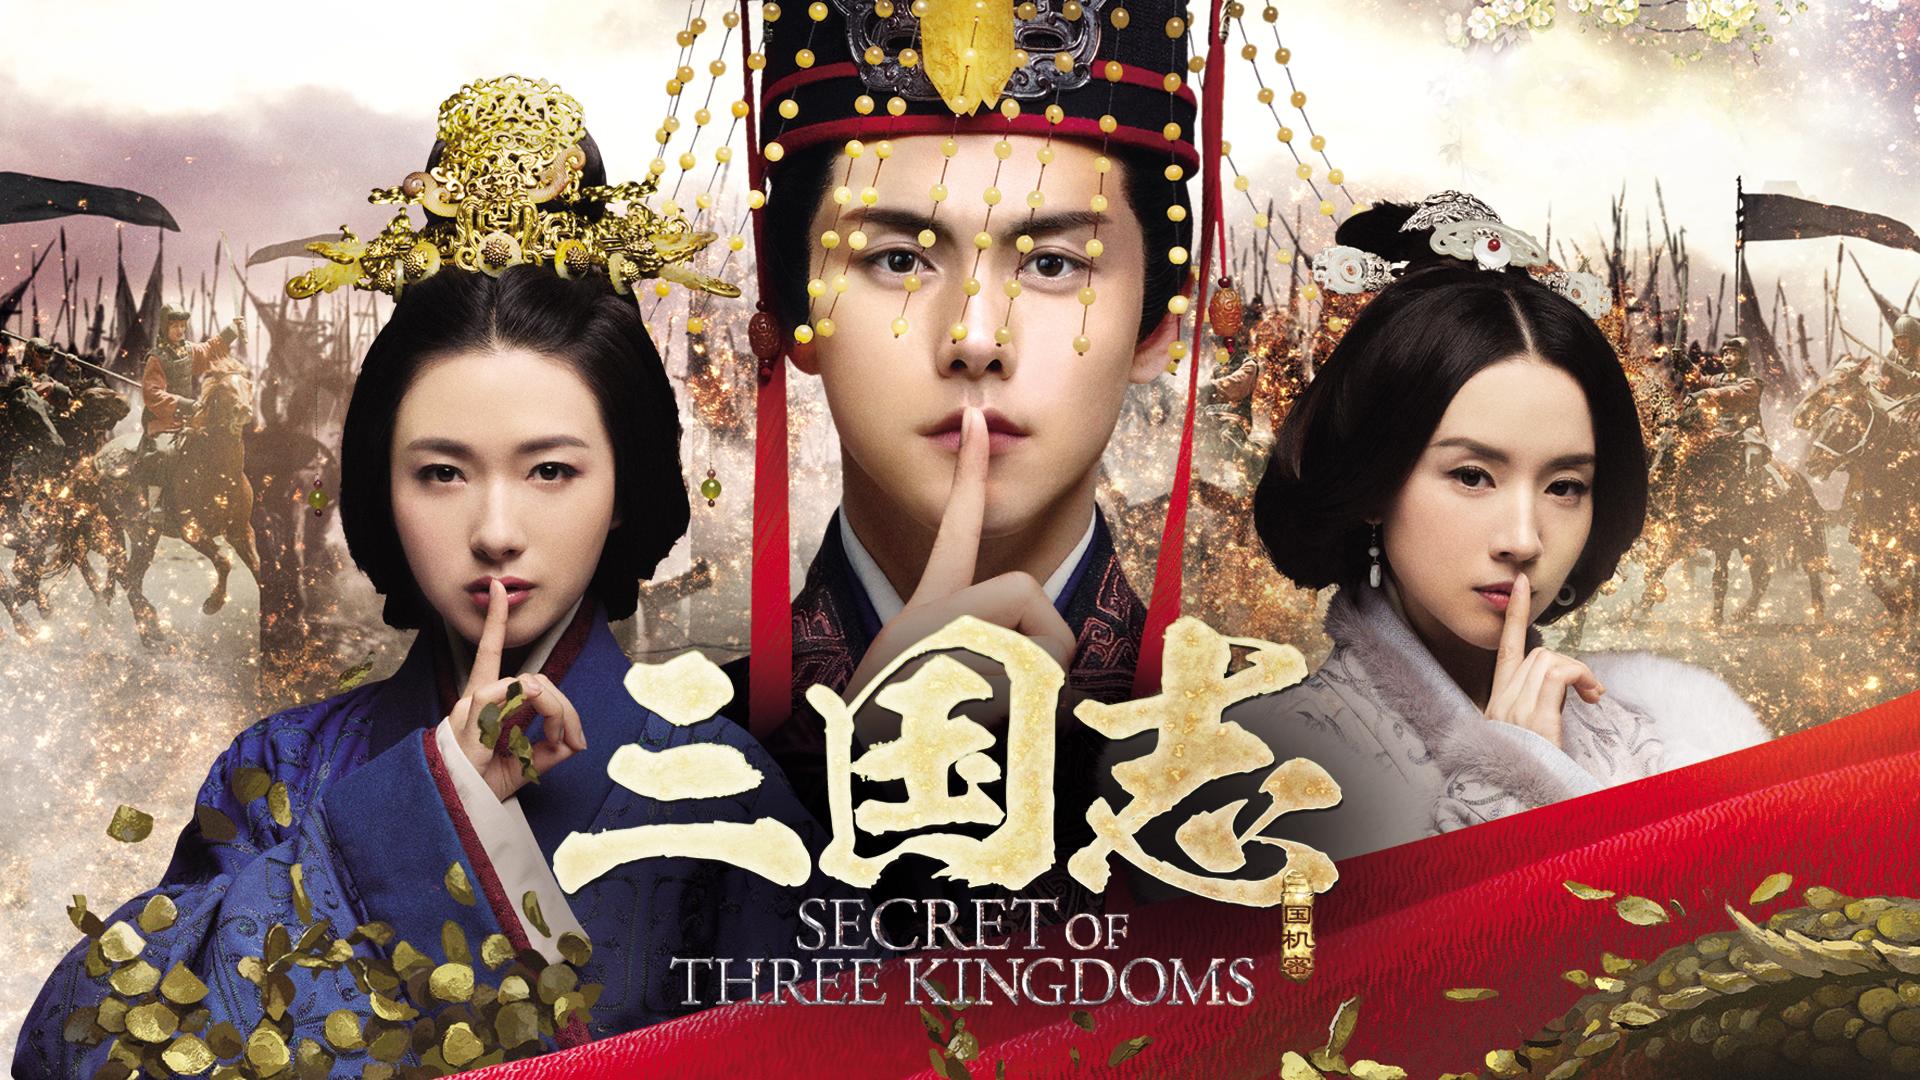 三国志 Secret of Three Kingdoms (字幕版)